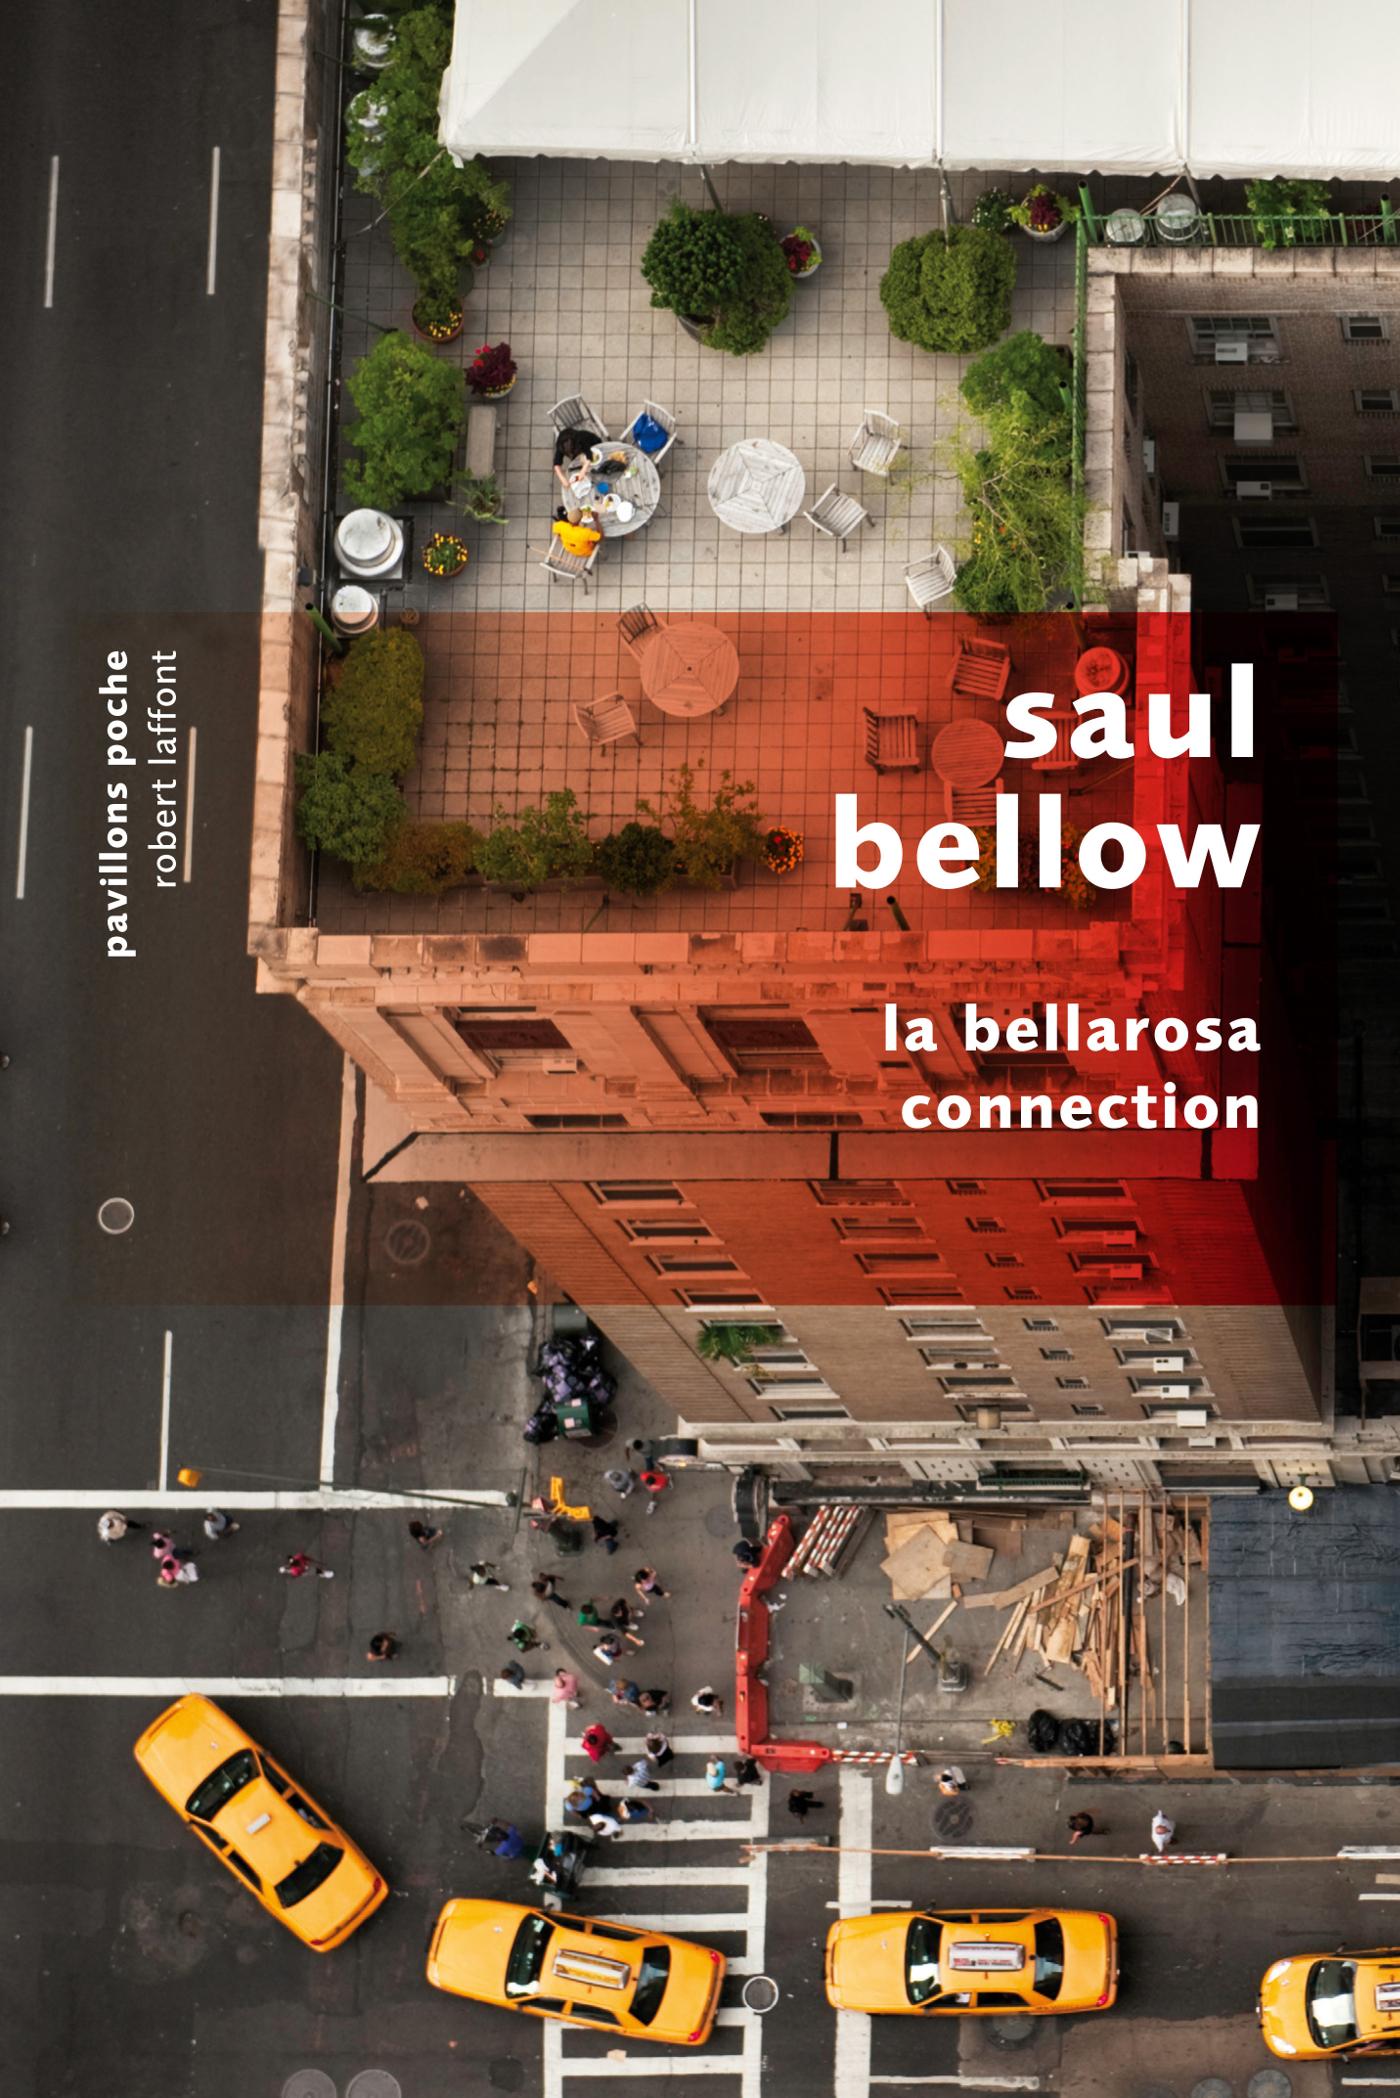 La Bellarosa connection | BELLOW, Saul